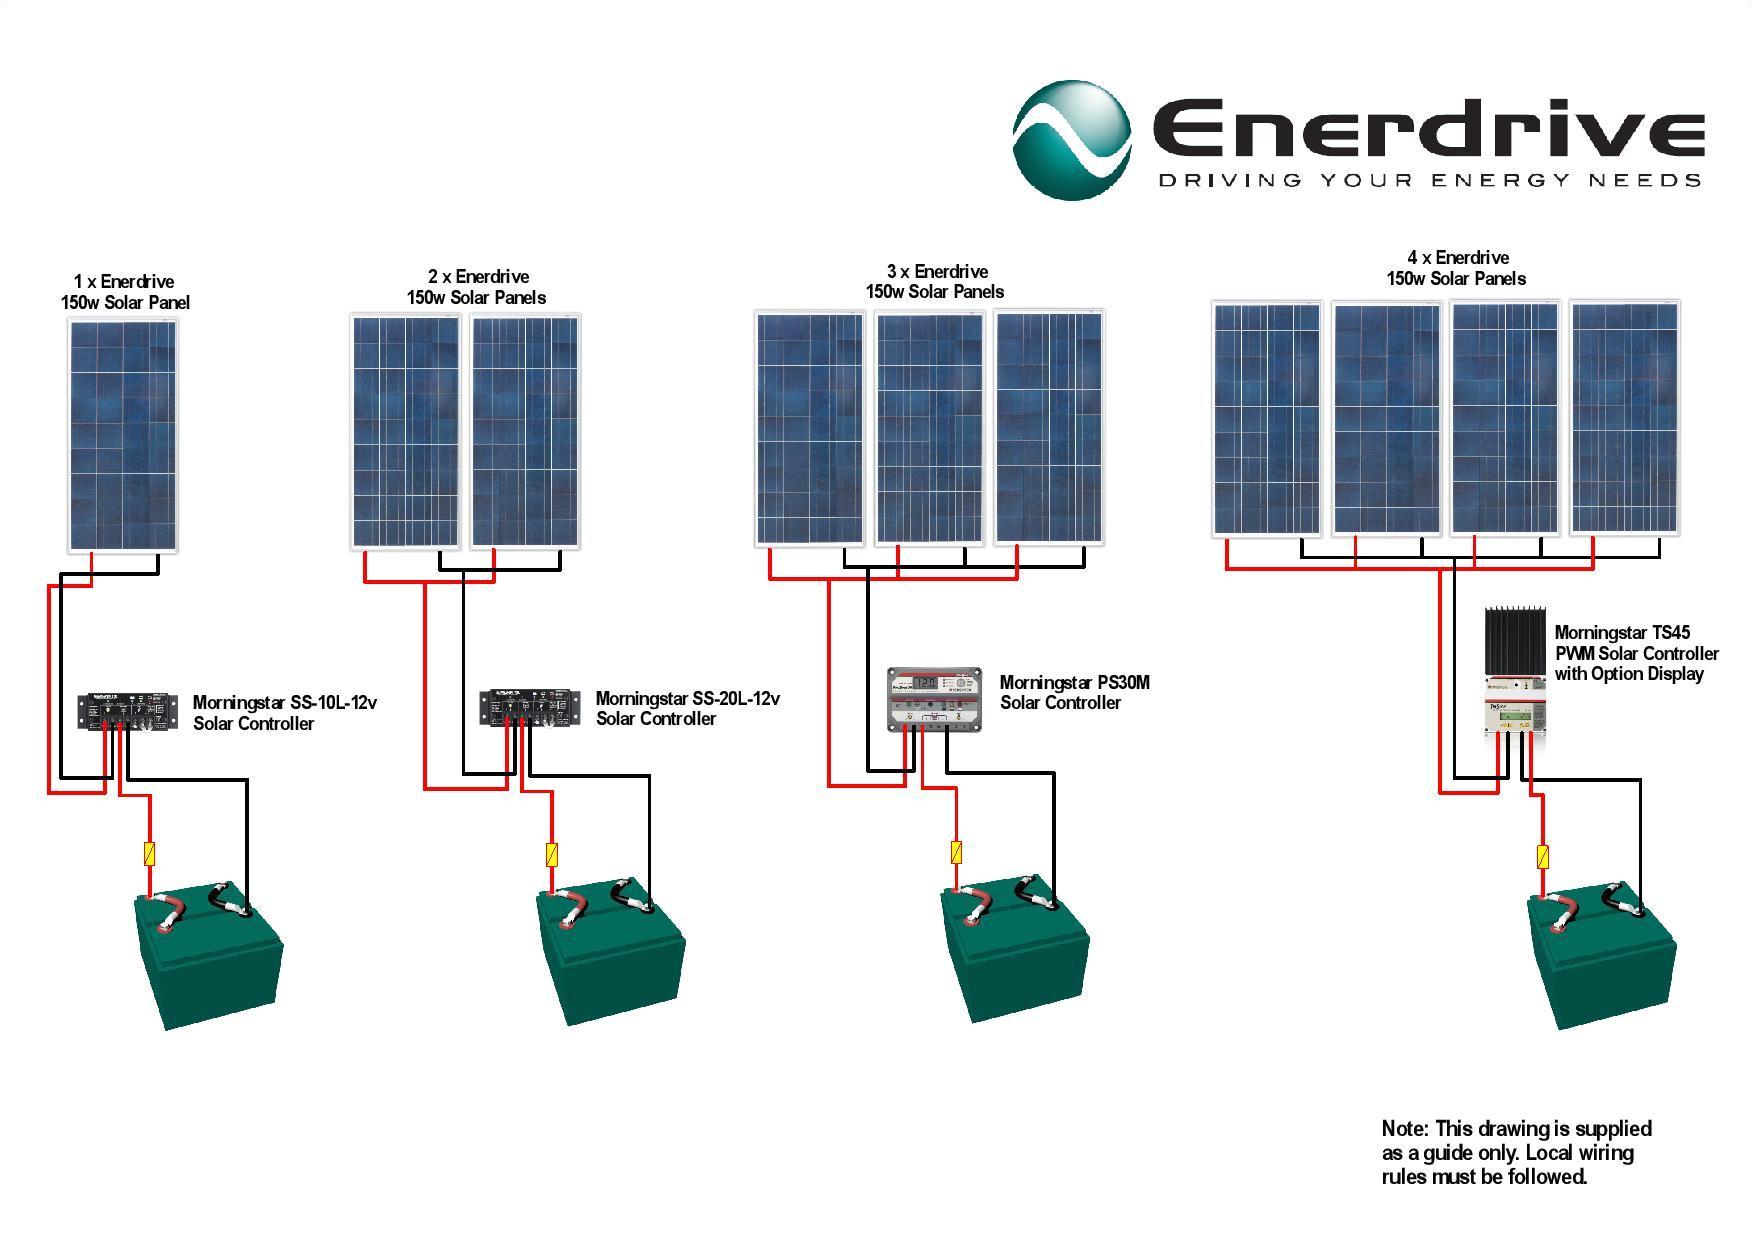 wiring diagram for solar panels wiring diagram mega solar panel wiring diagram rv 12v solar panel